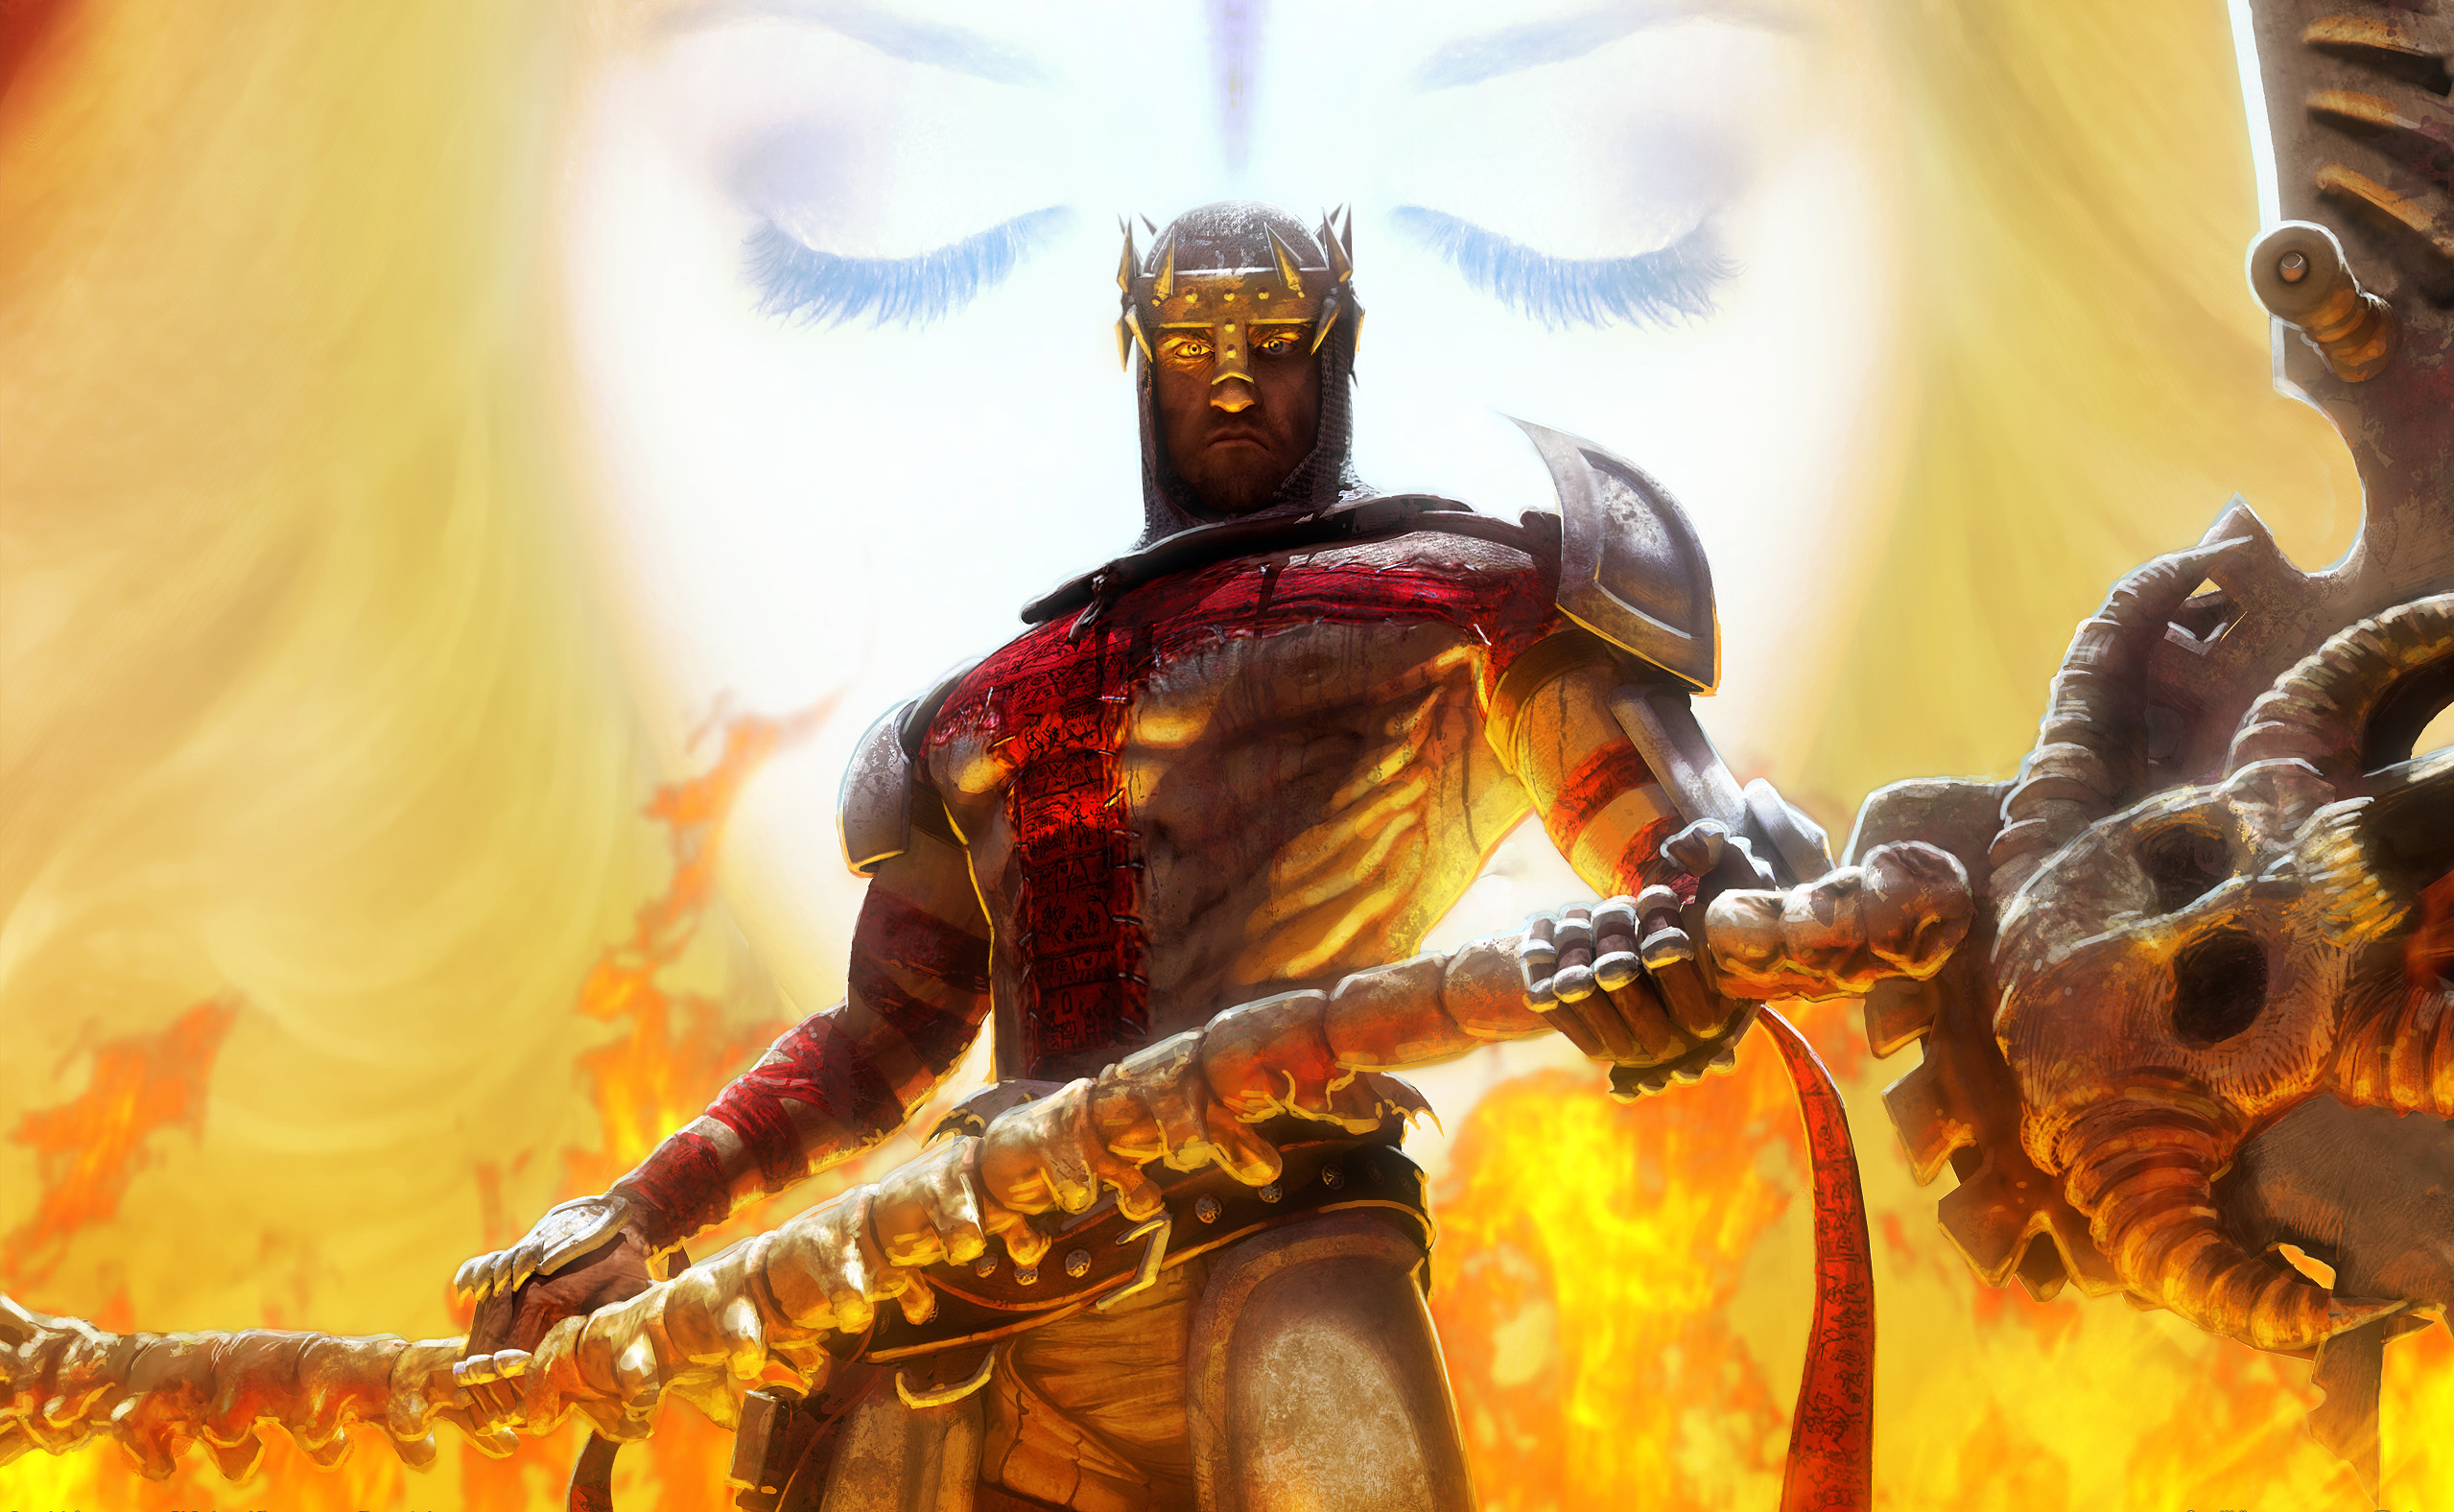 S Hd Image Wallpaper: Dante's Inferno HD Wallpaper